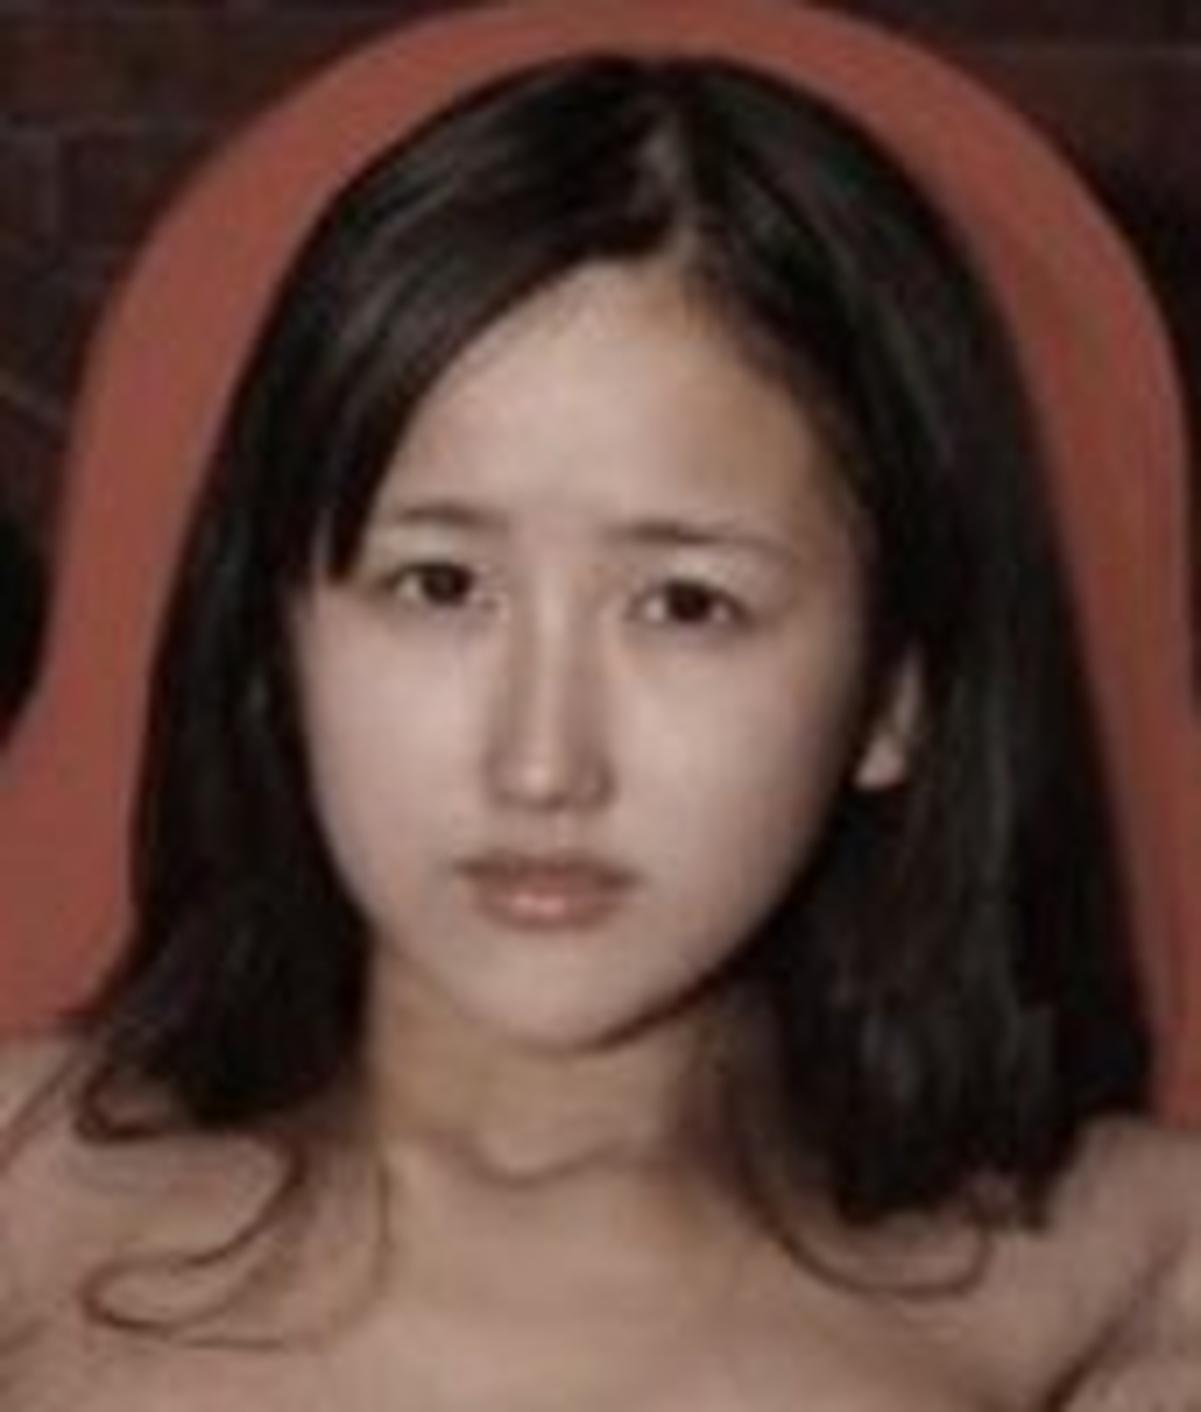 Suzu Ichinose